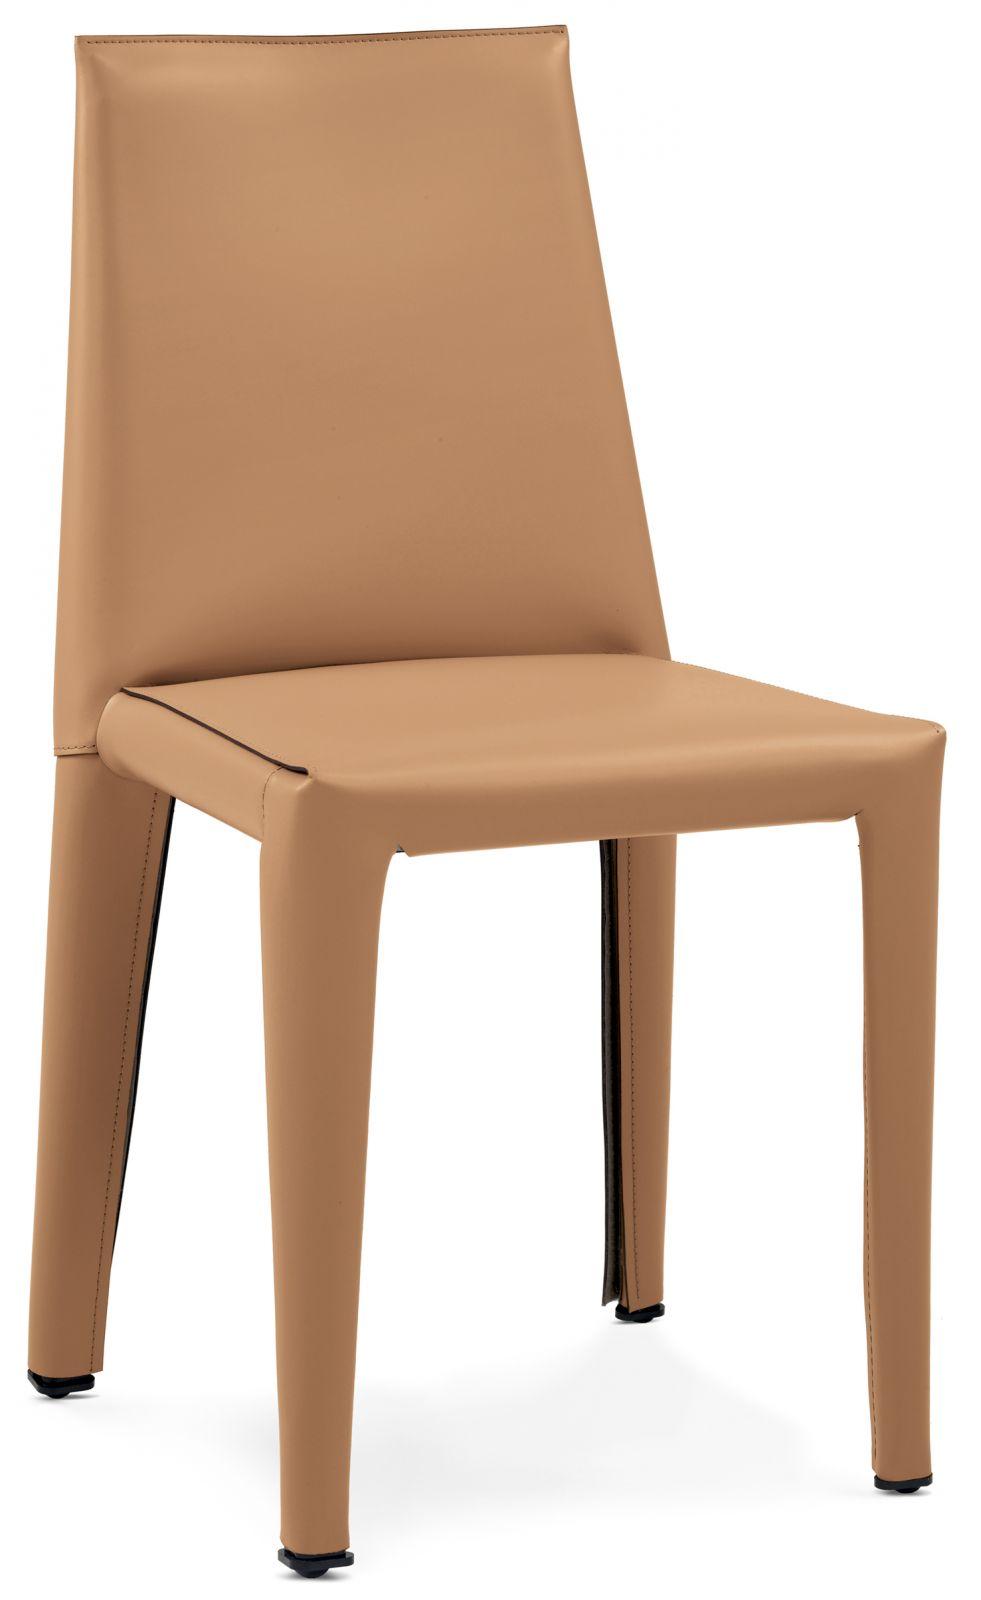 modern-office-furniture-chairs-Italian-designer-furniture (17).jpg